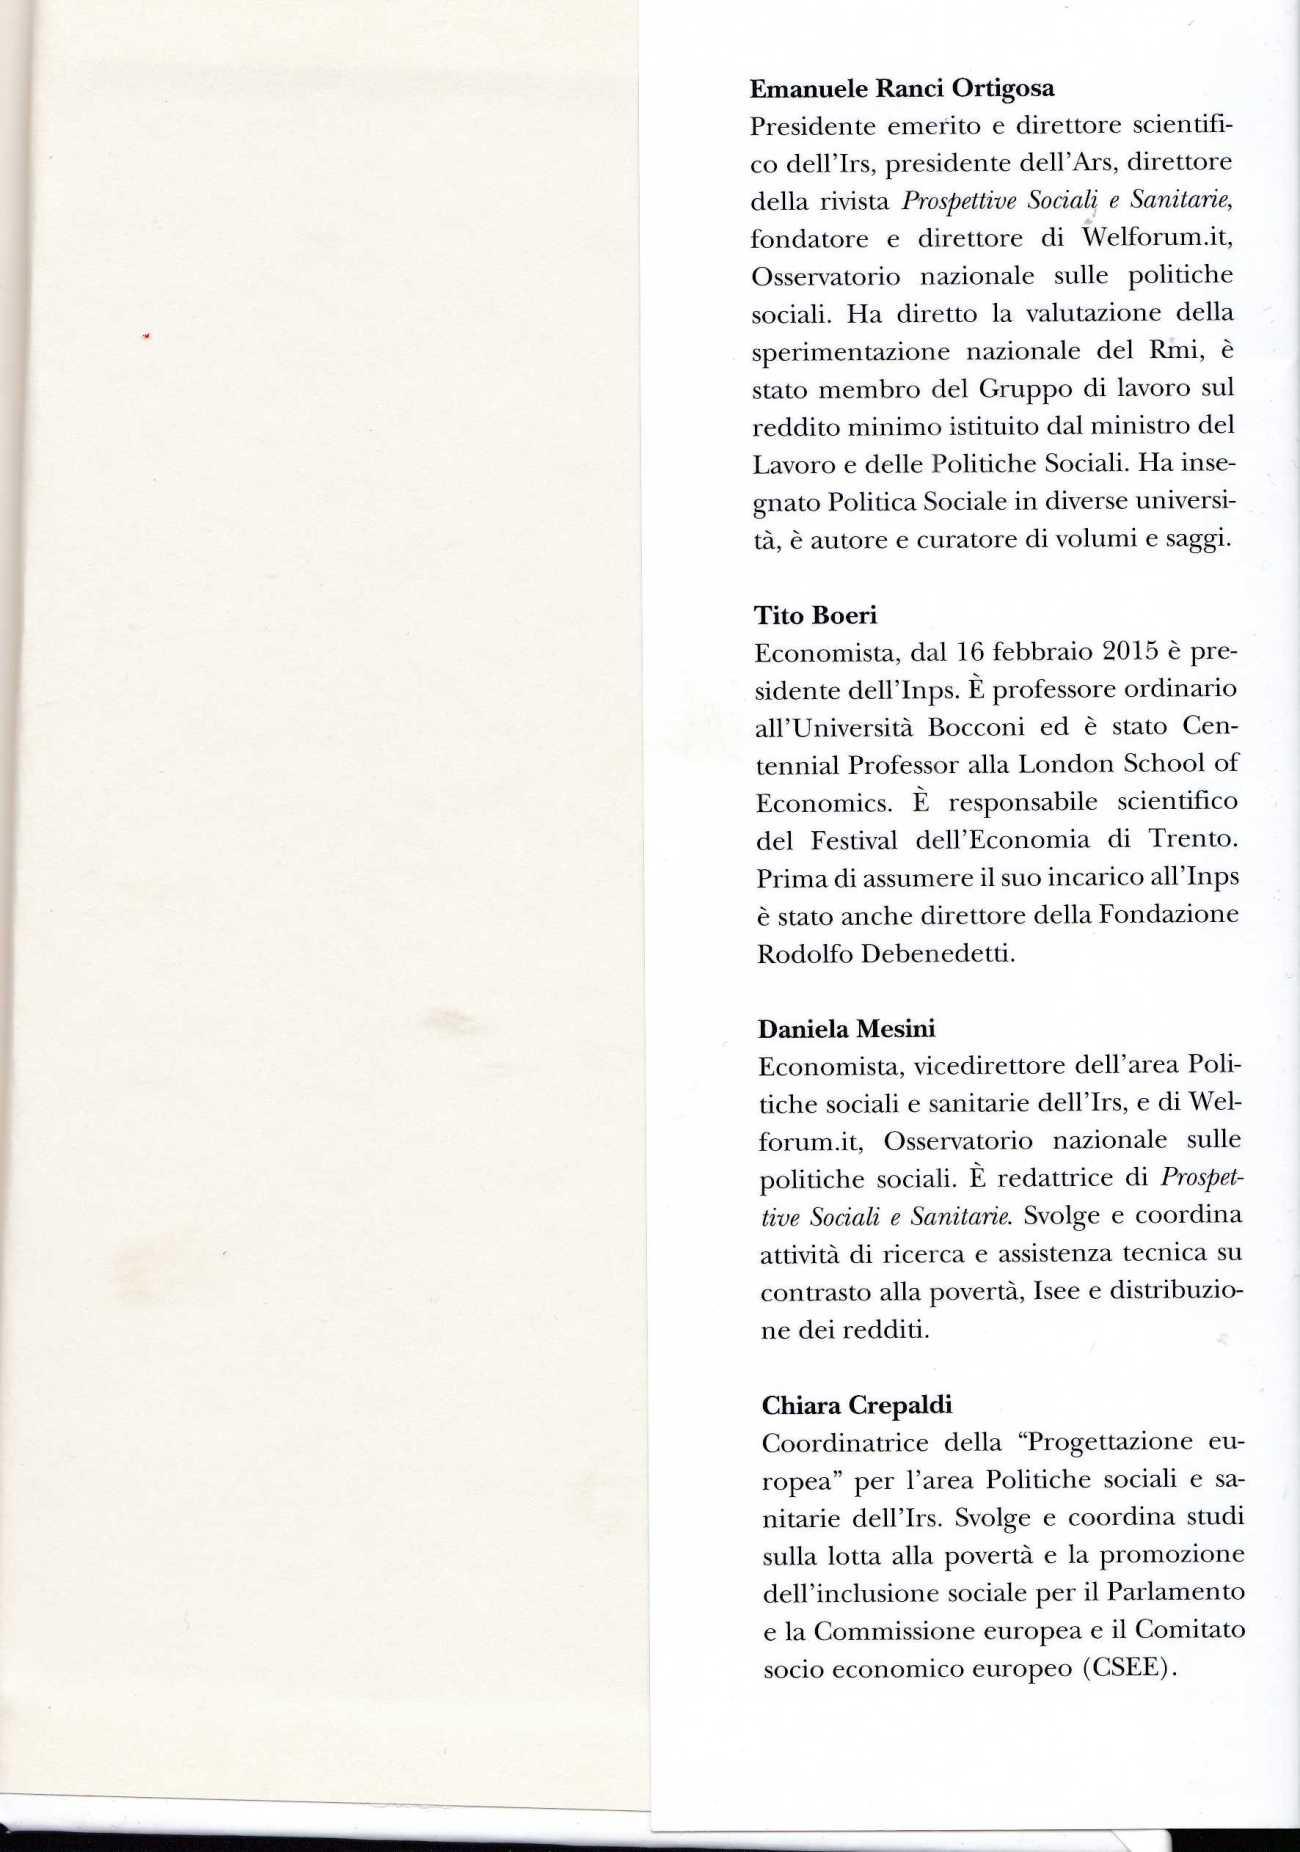 ORTIGOSA POVERTA2812